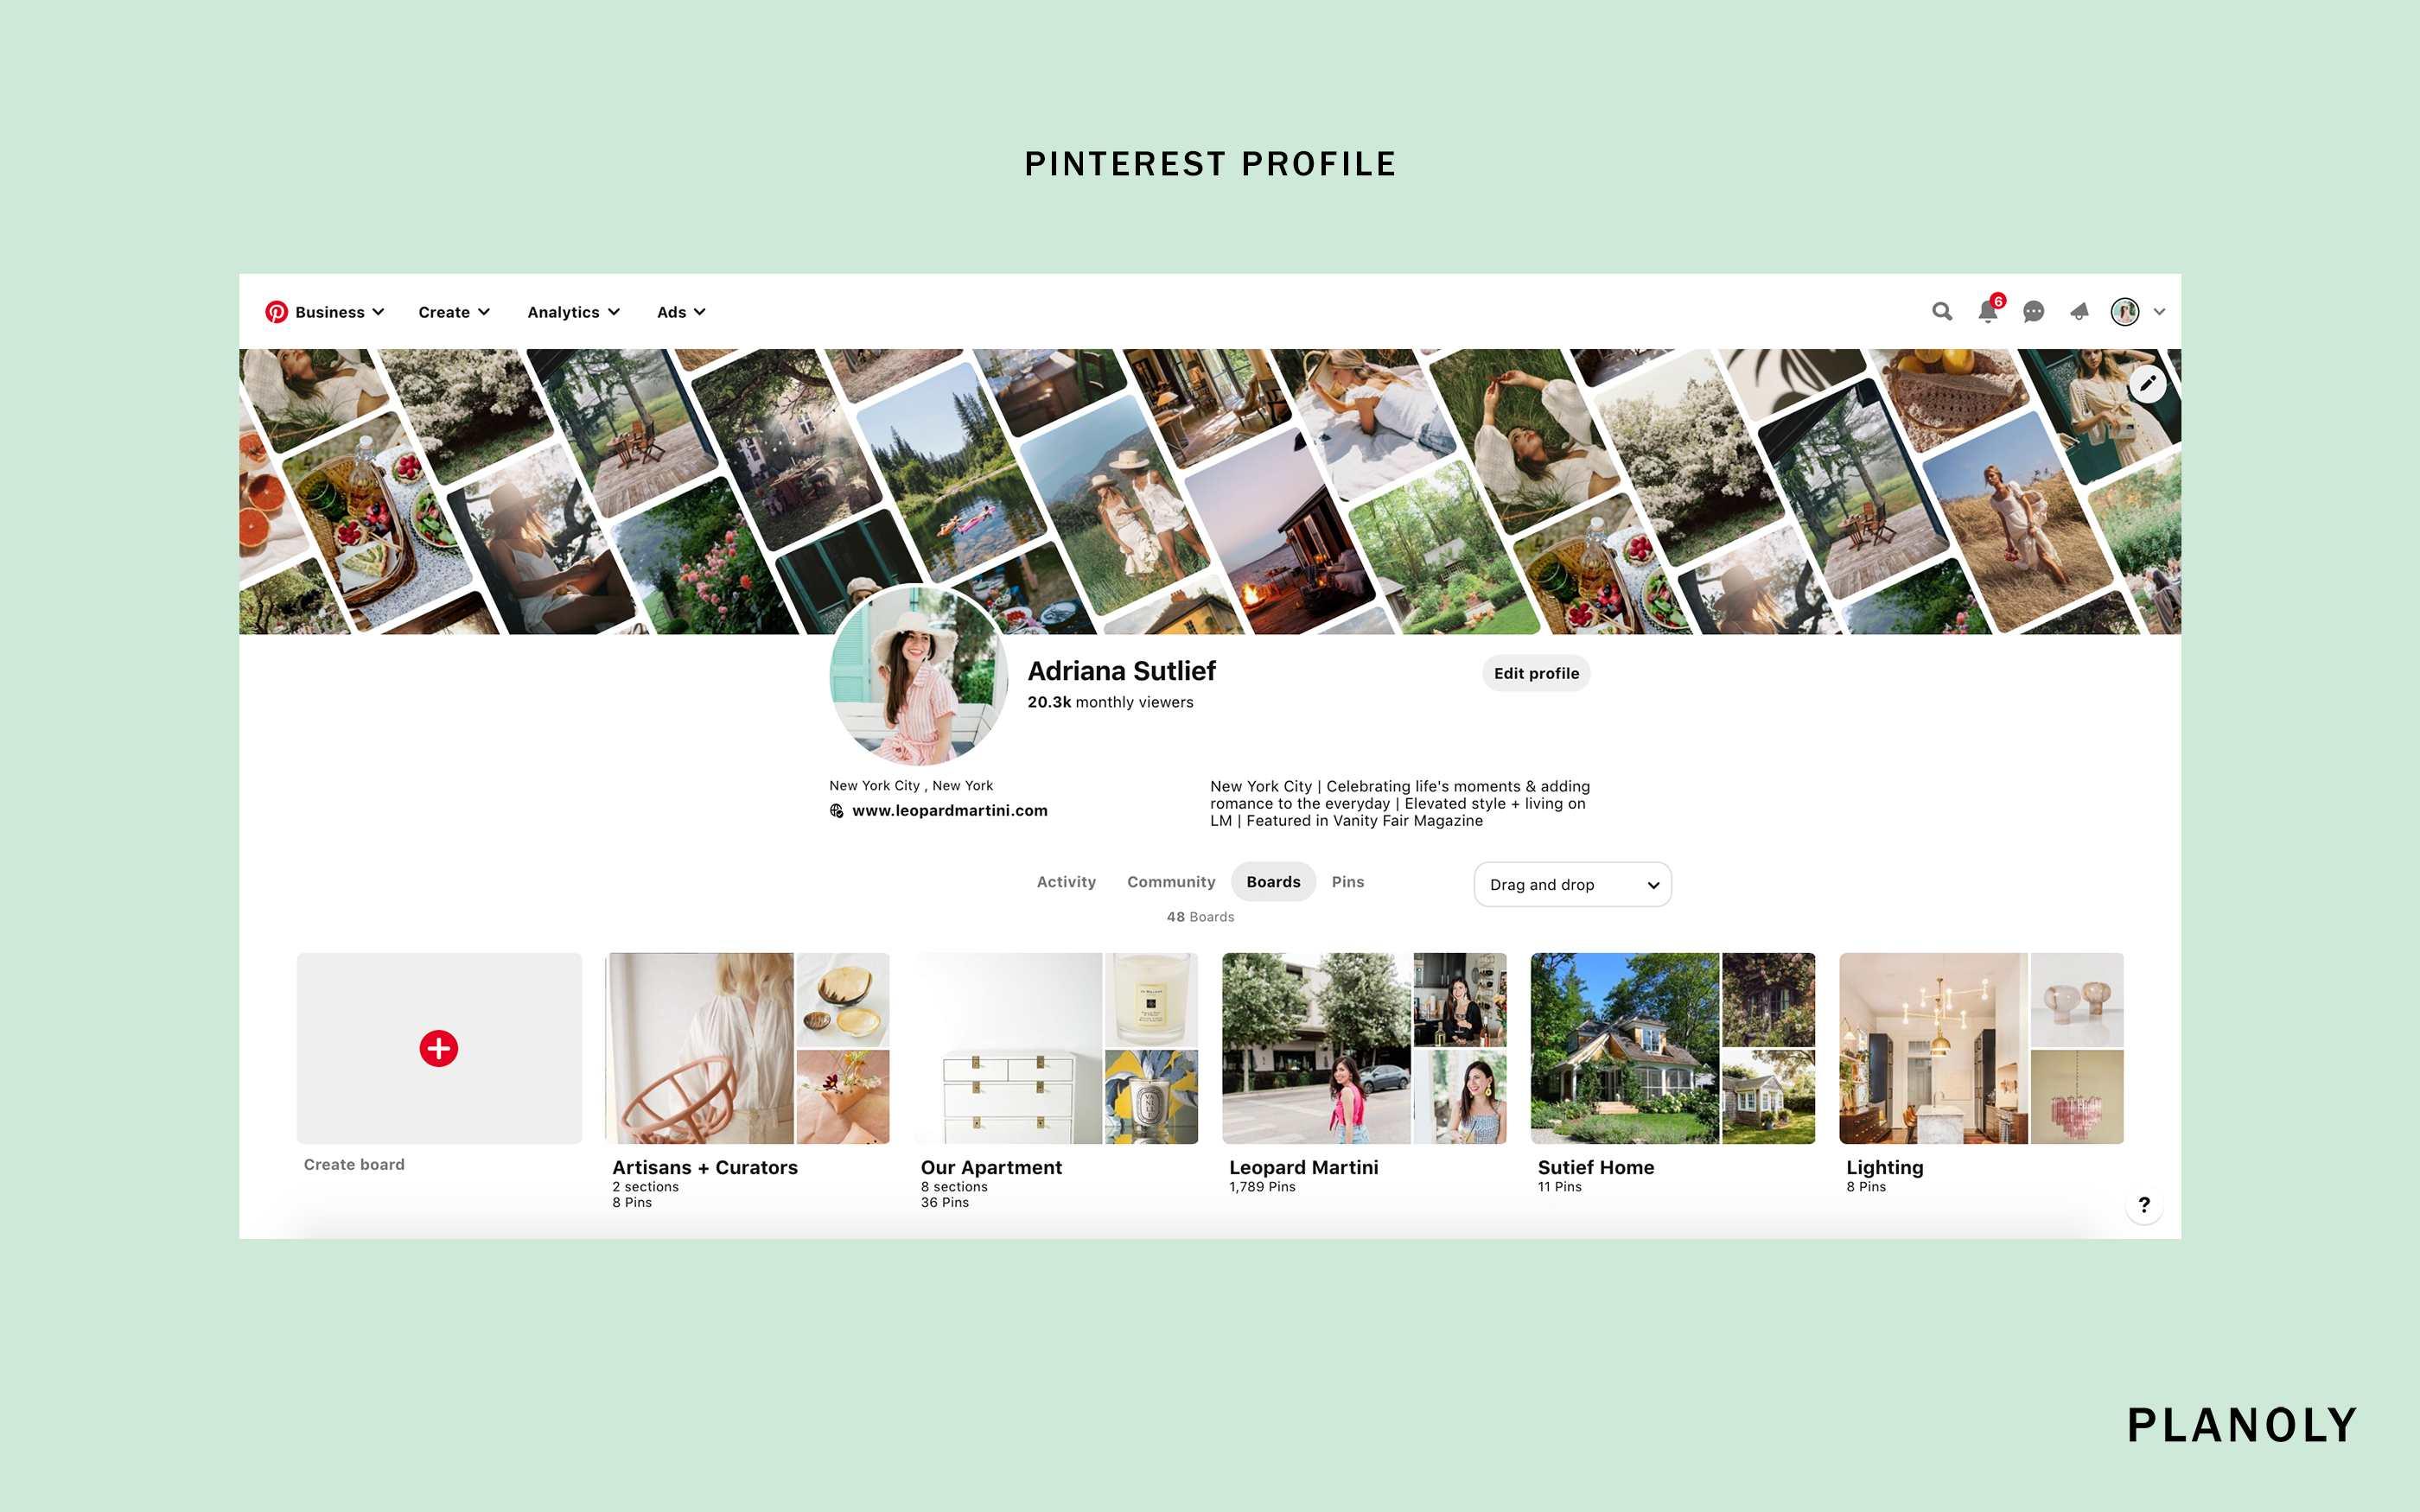 PLANOLY - Blog Post - FAQ - PLANOLY Pin Planner - Image 2